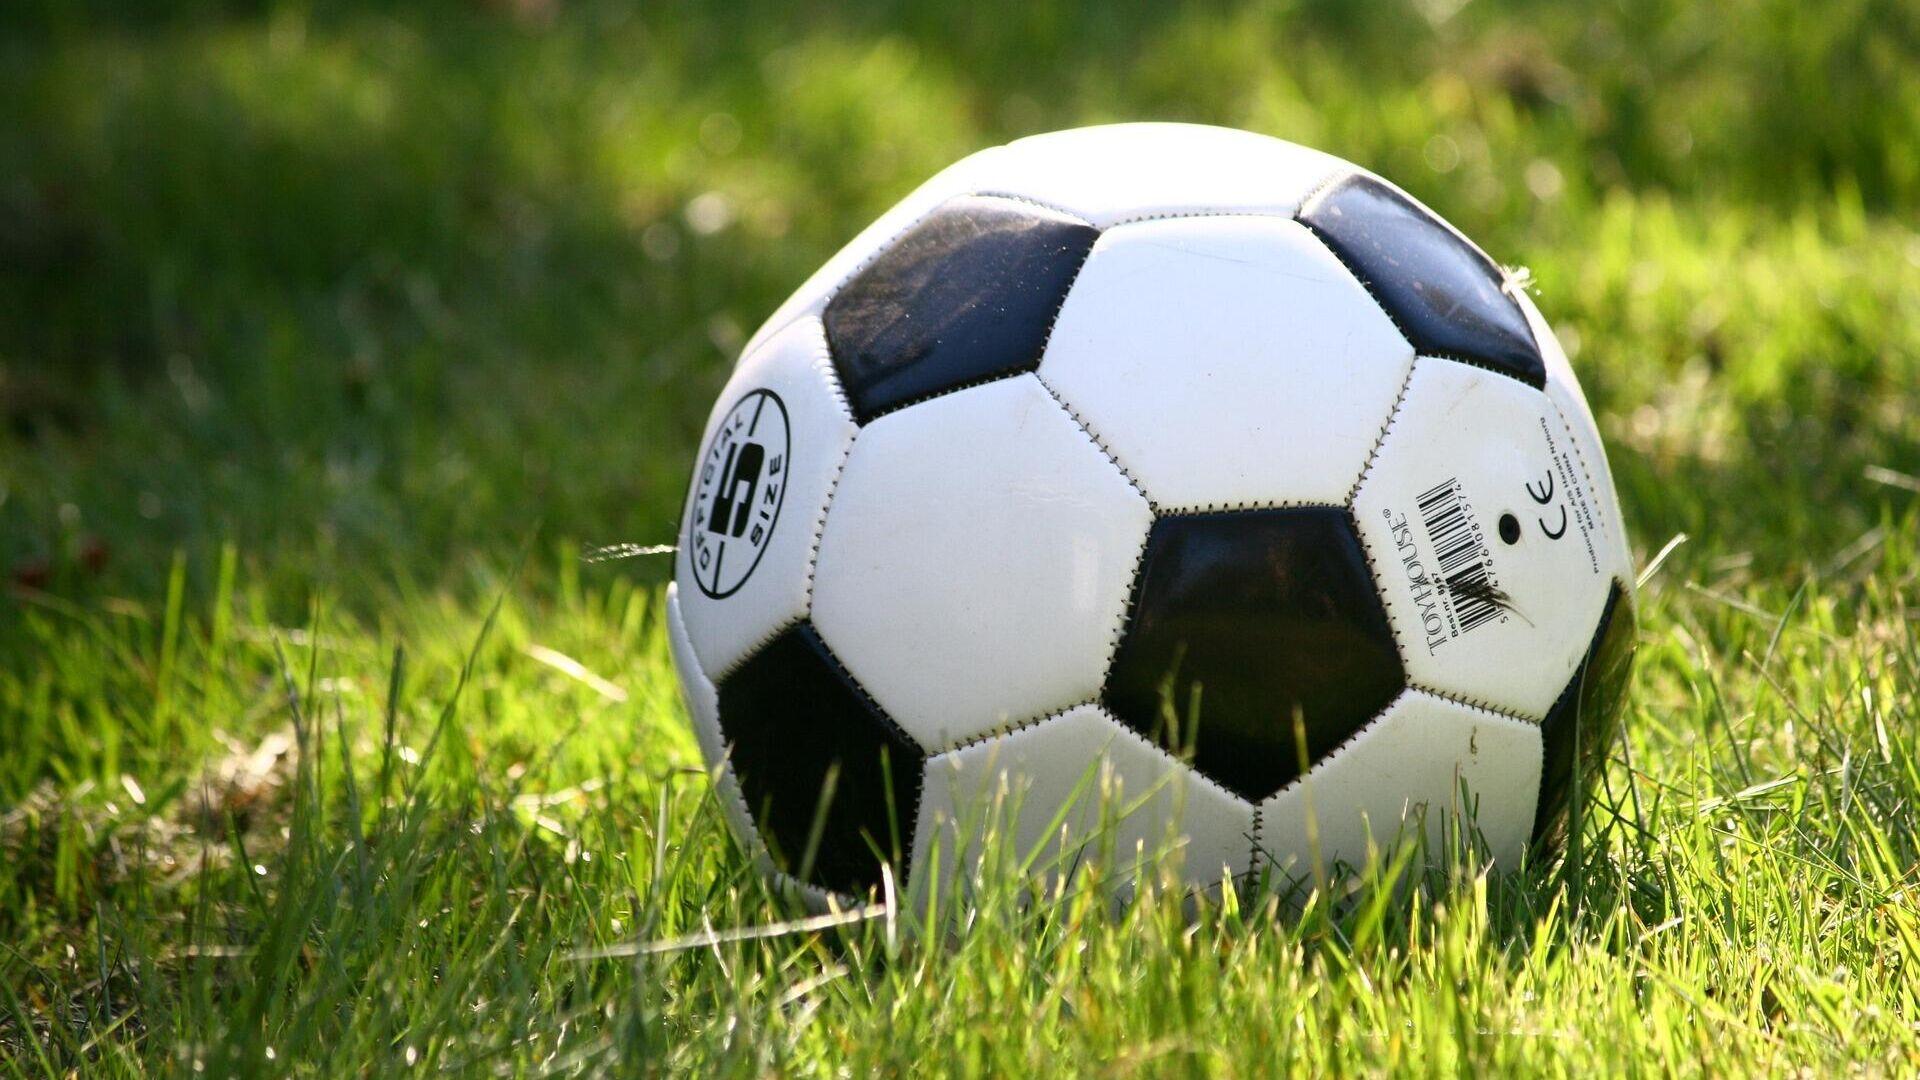 balón de fútbol (imagen referencial) - Sputnik Mundo, 1920, 07.04.2021